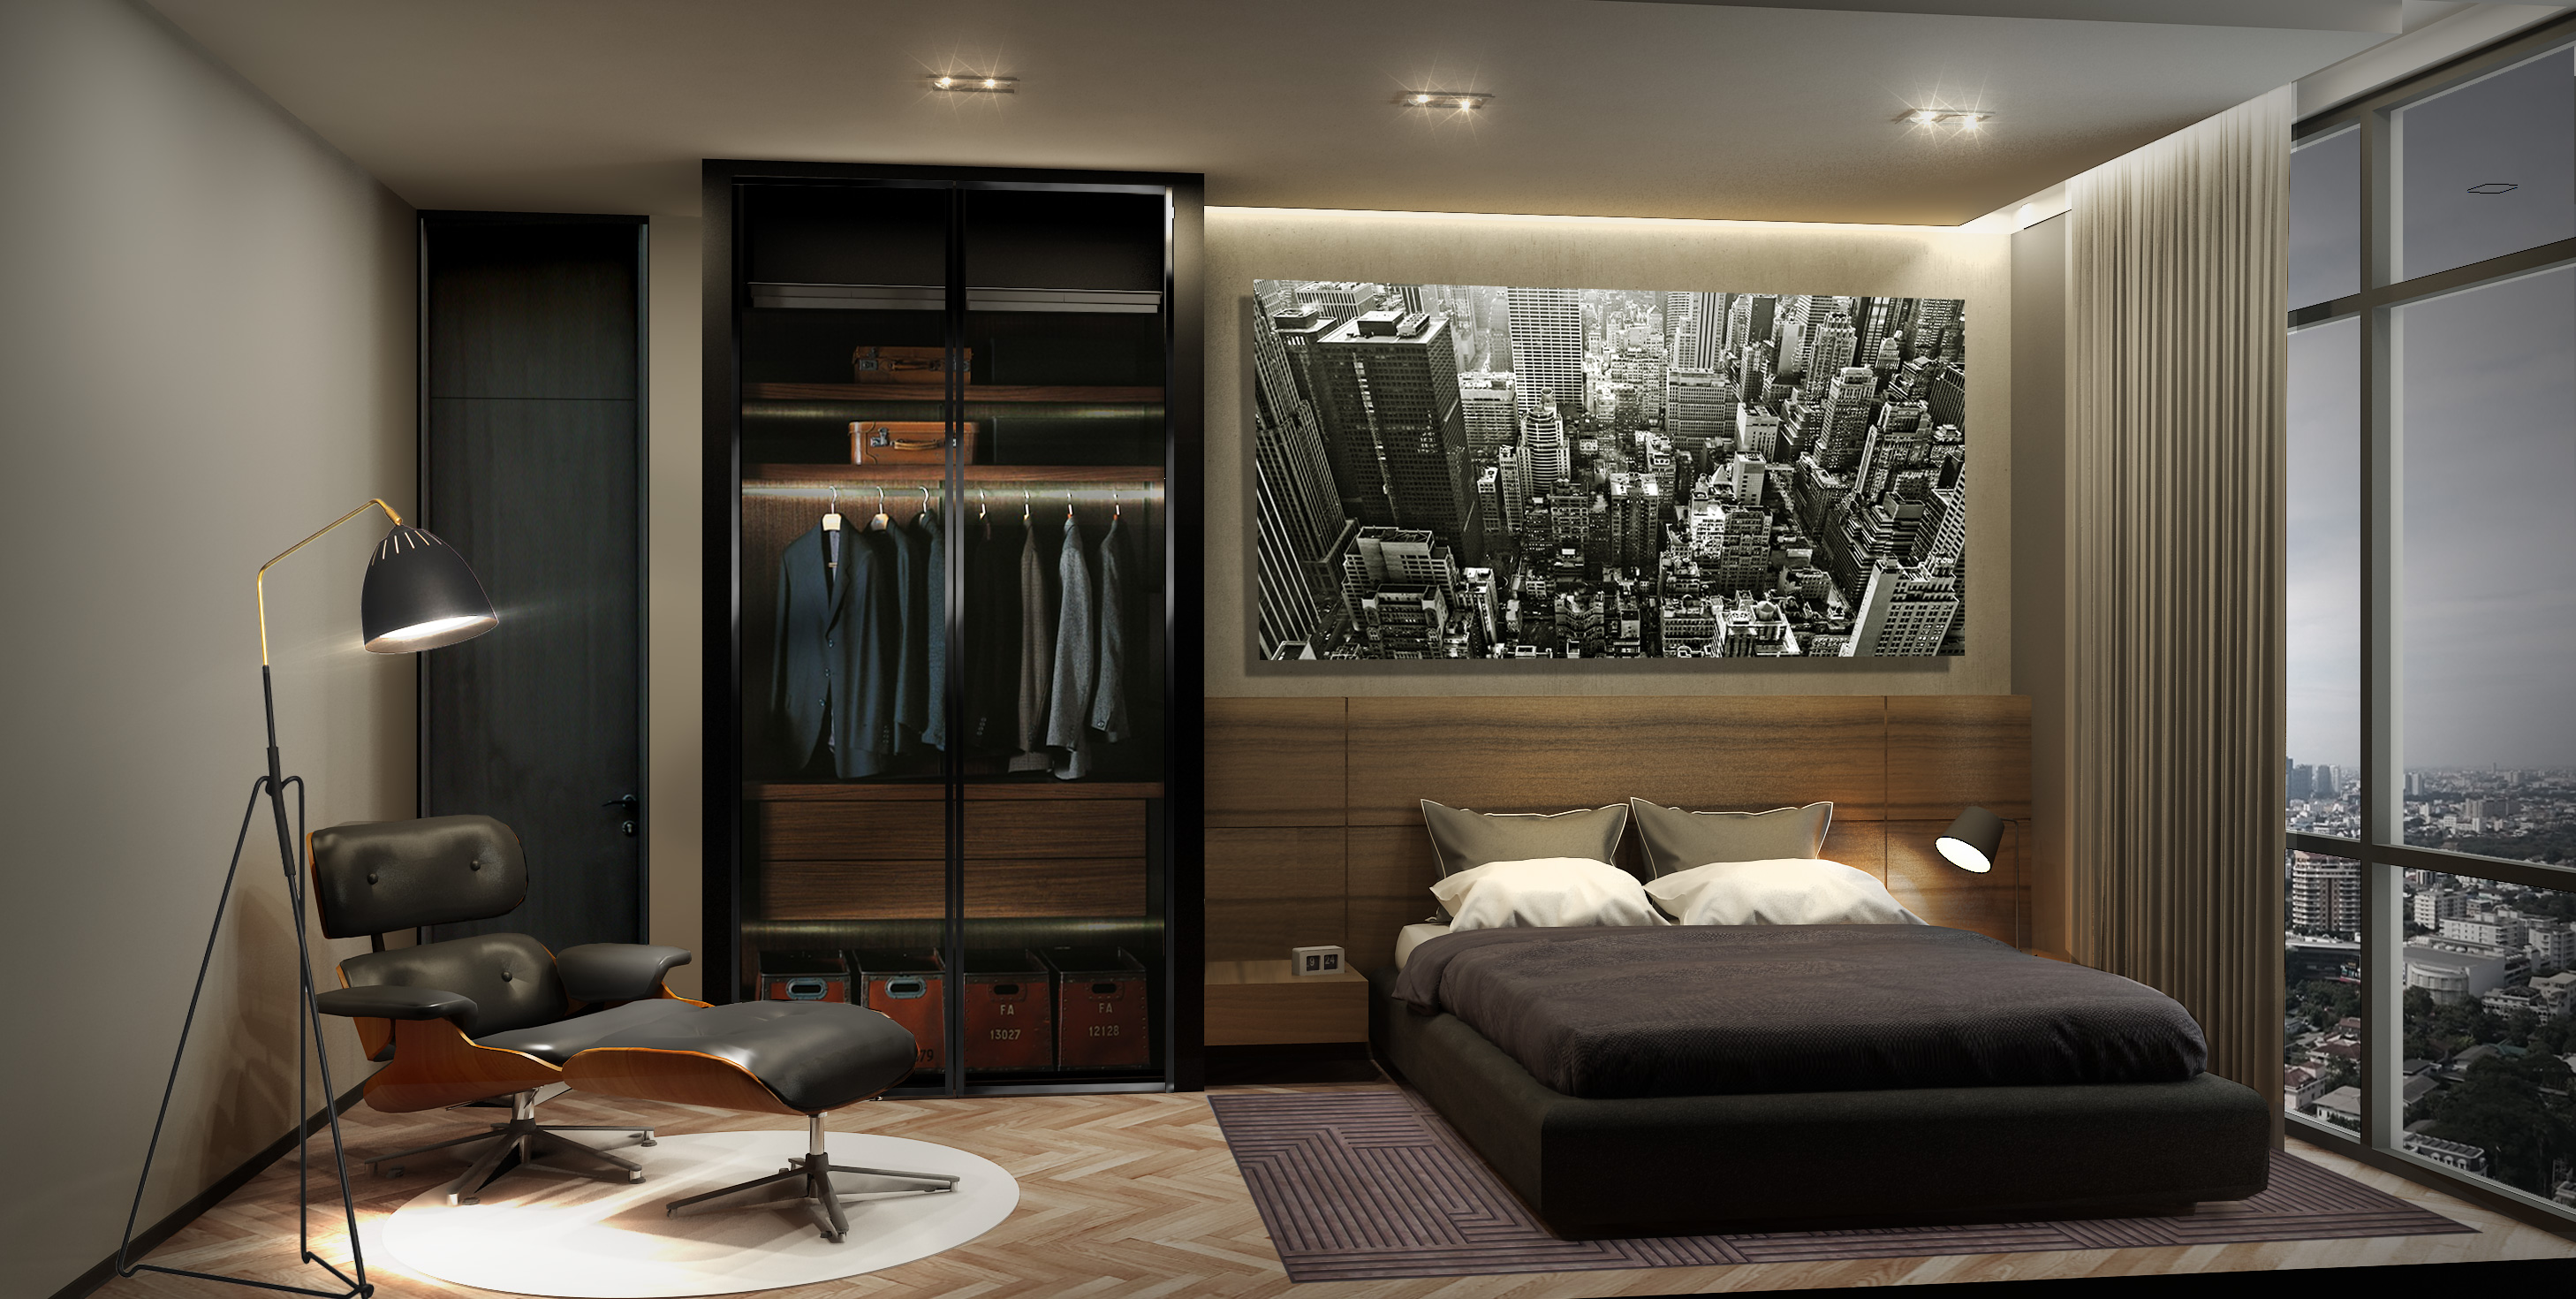 TBT-DAF interior design residence tony residence 6